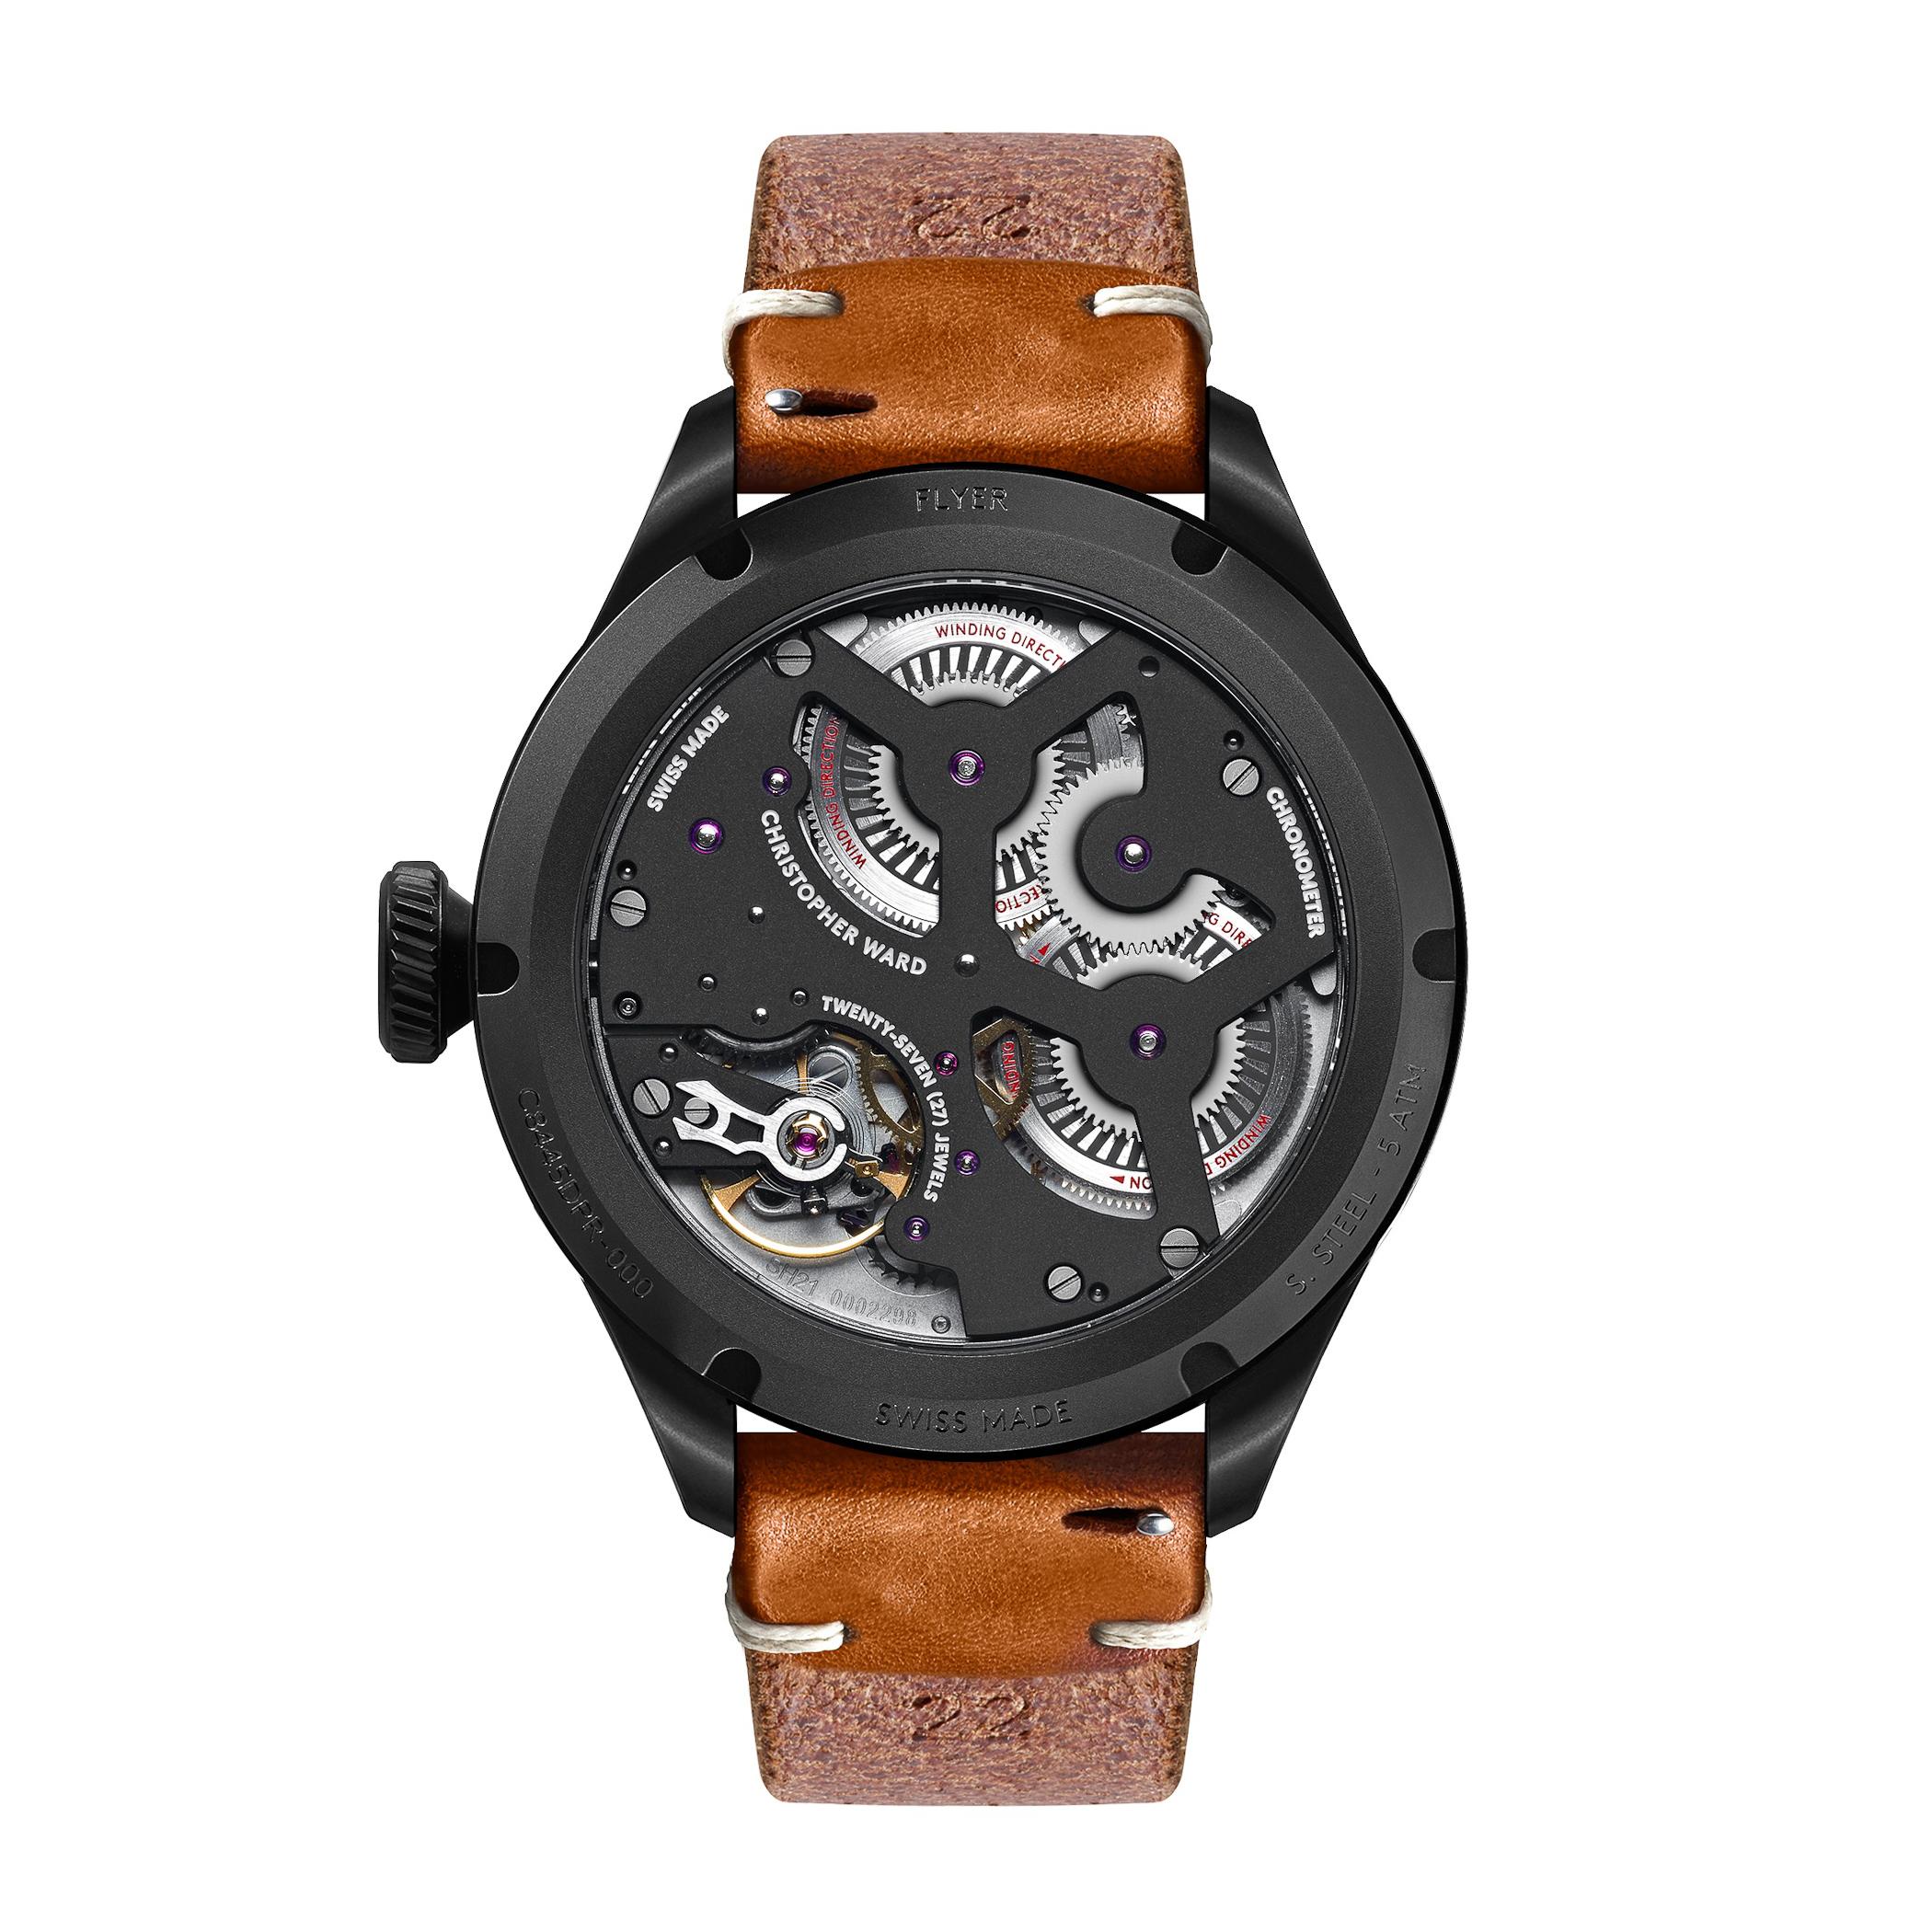 ChristopherWard-C8 Power Reserve Chronometer-1